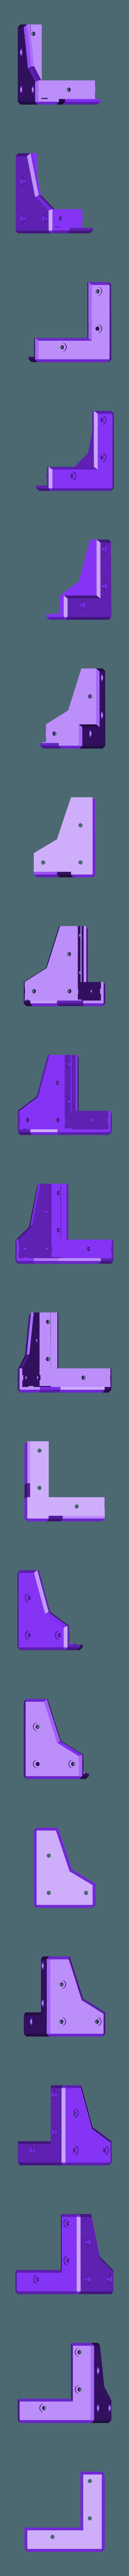 2020-Corner-Long-DeltaB.stl Download free STL file 2020 Profile Aluminum 3D Printable Erector Set • 3D printer model, adamjvr